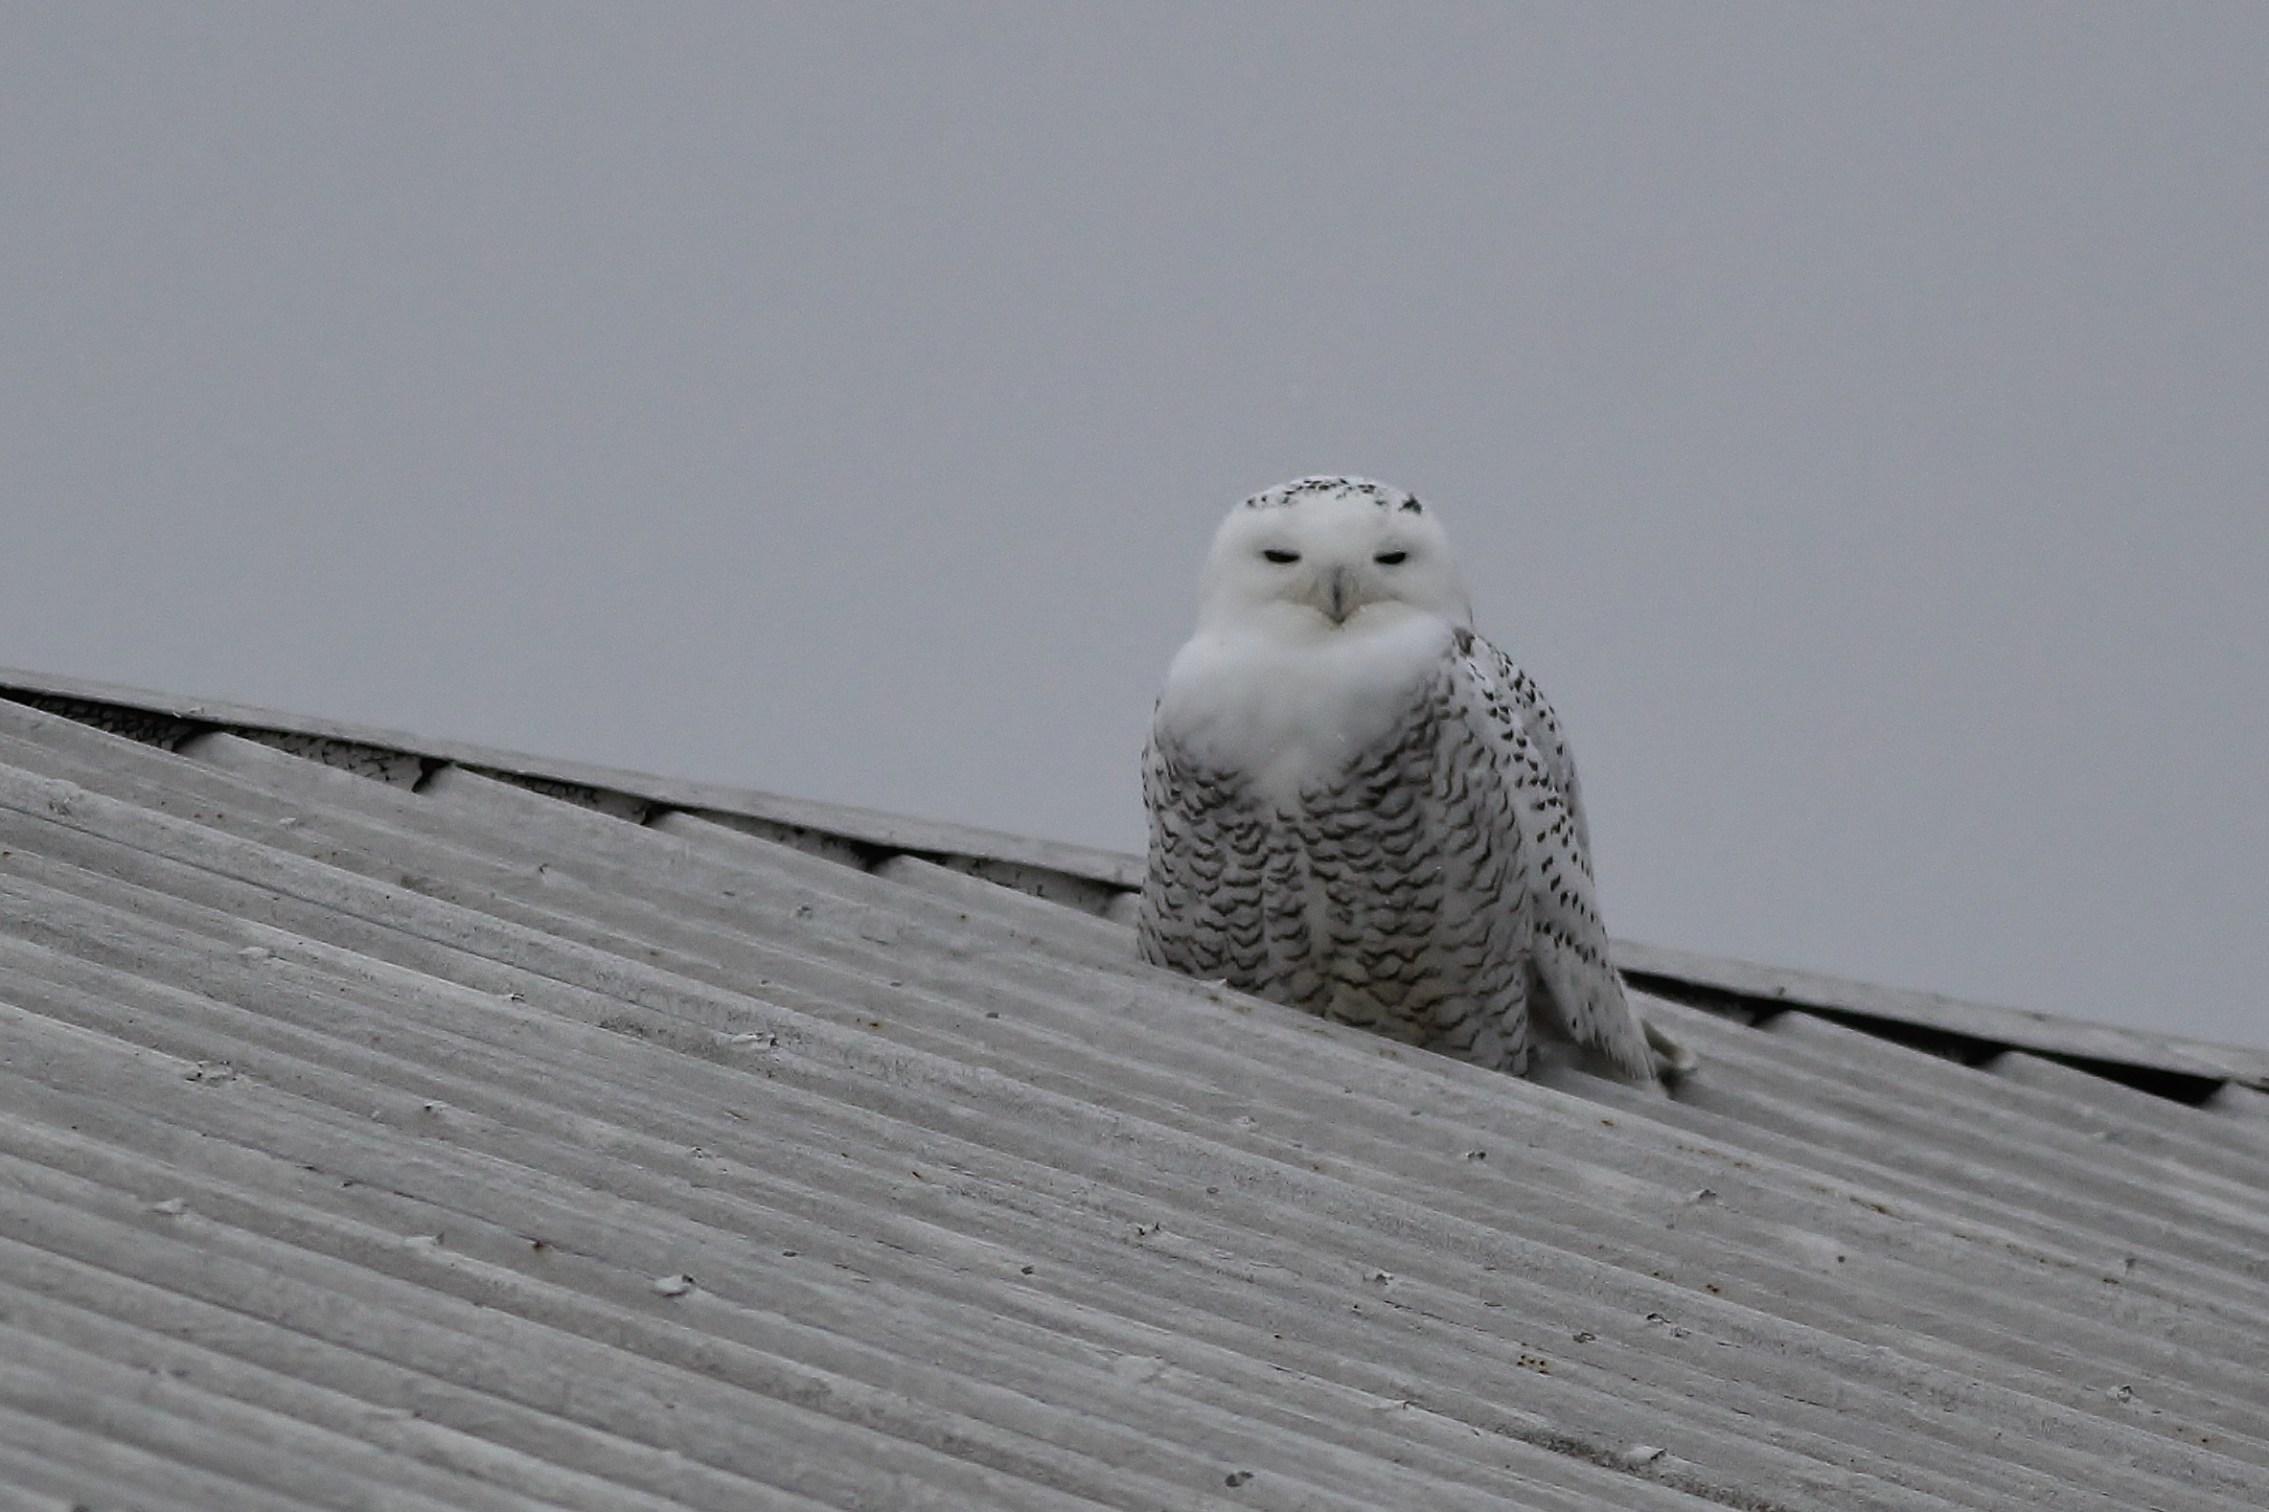 Snowy Owl - Berks County, PA by Alex Lamoreaux | Nemesis Bird